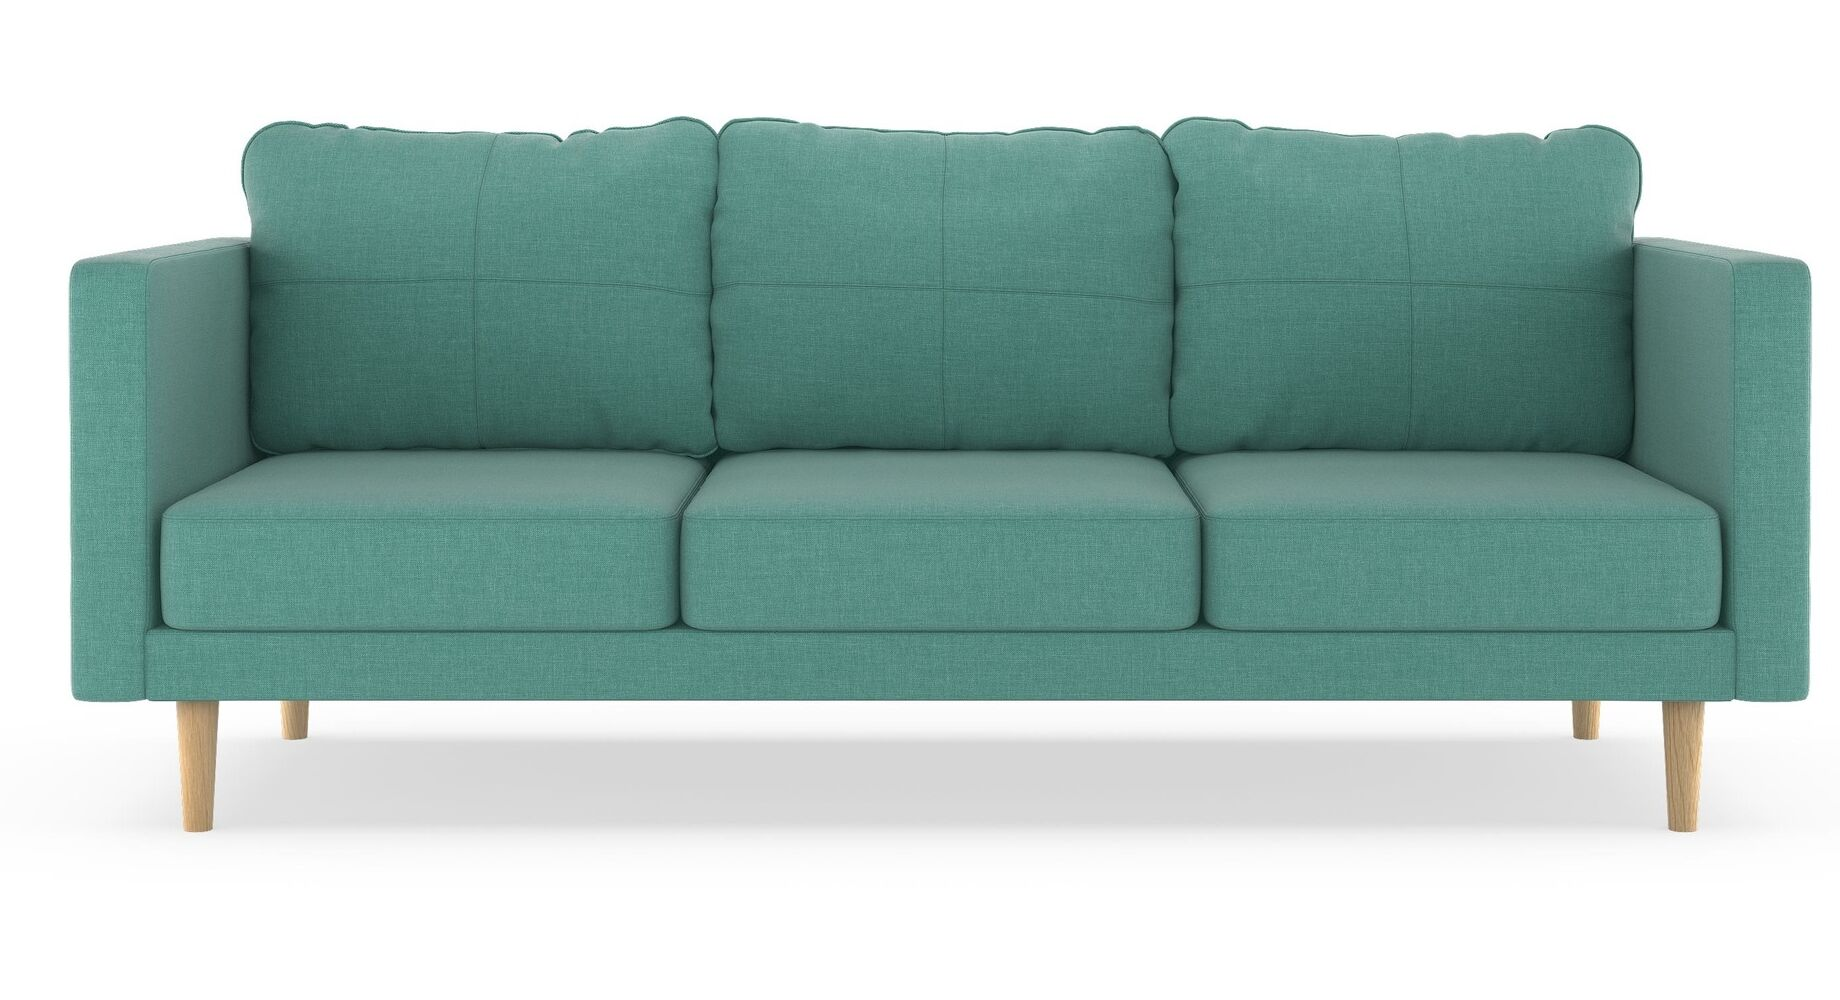 Rocio Linen Weave Sofa Finish: Black, Upholstery: Peppercorn